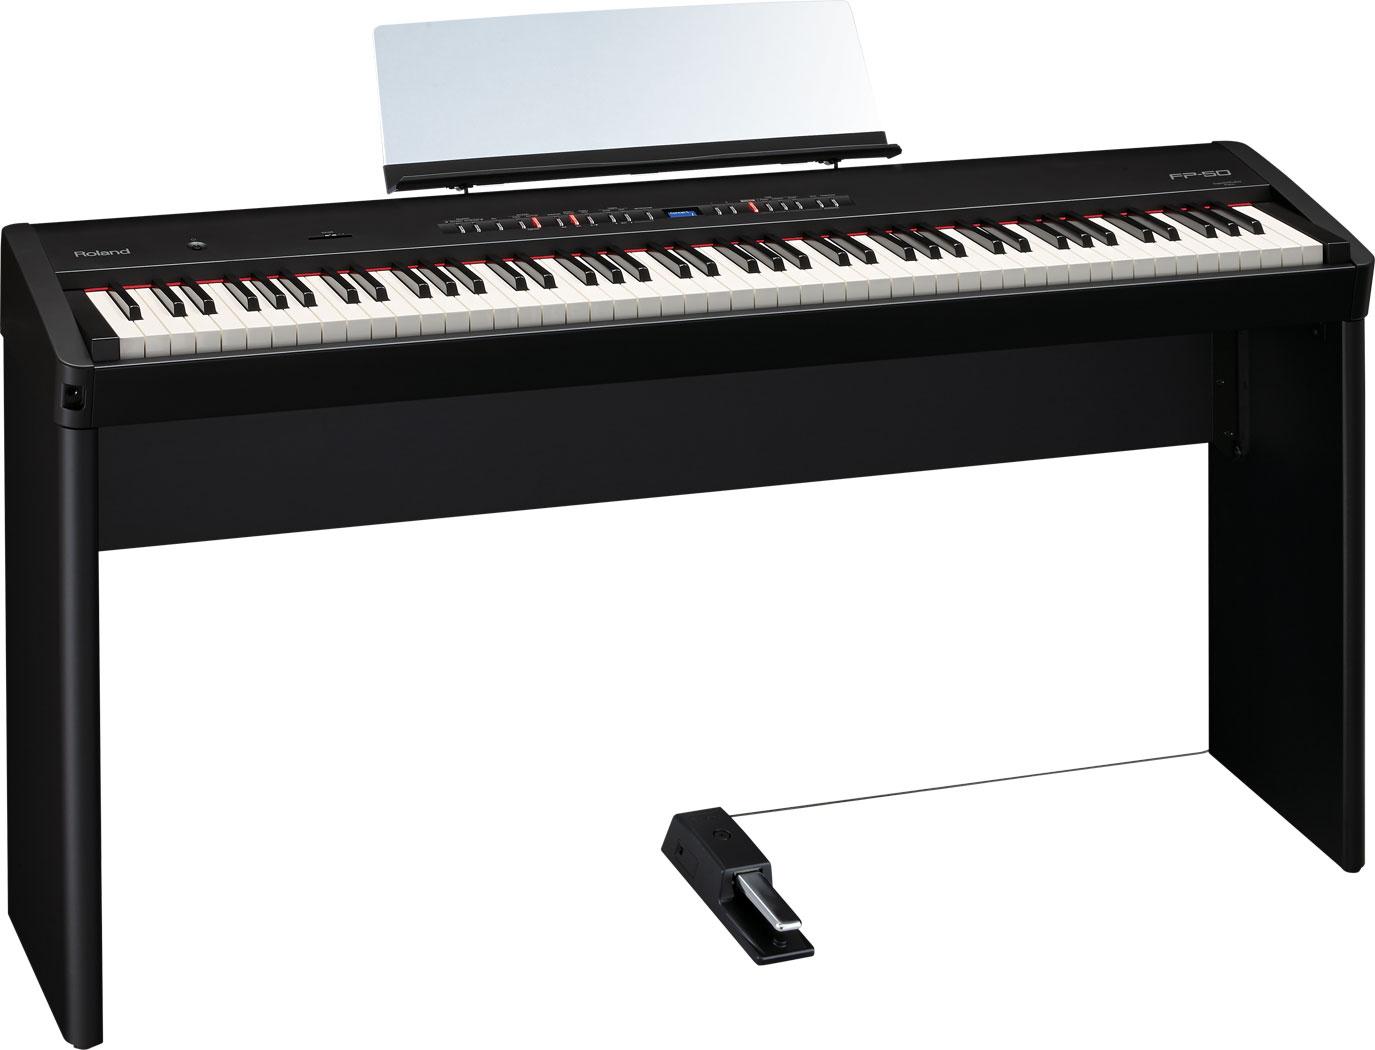 roland fp 50 digital piano. Black Bedroom Furniture Sets. Home Design Ideas